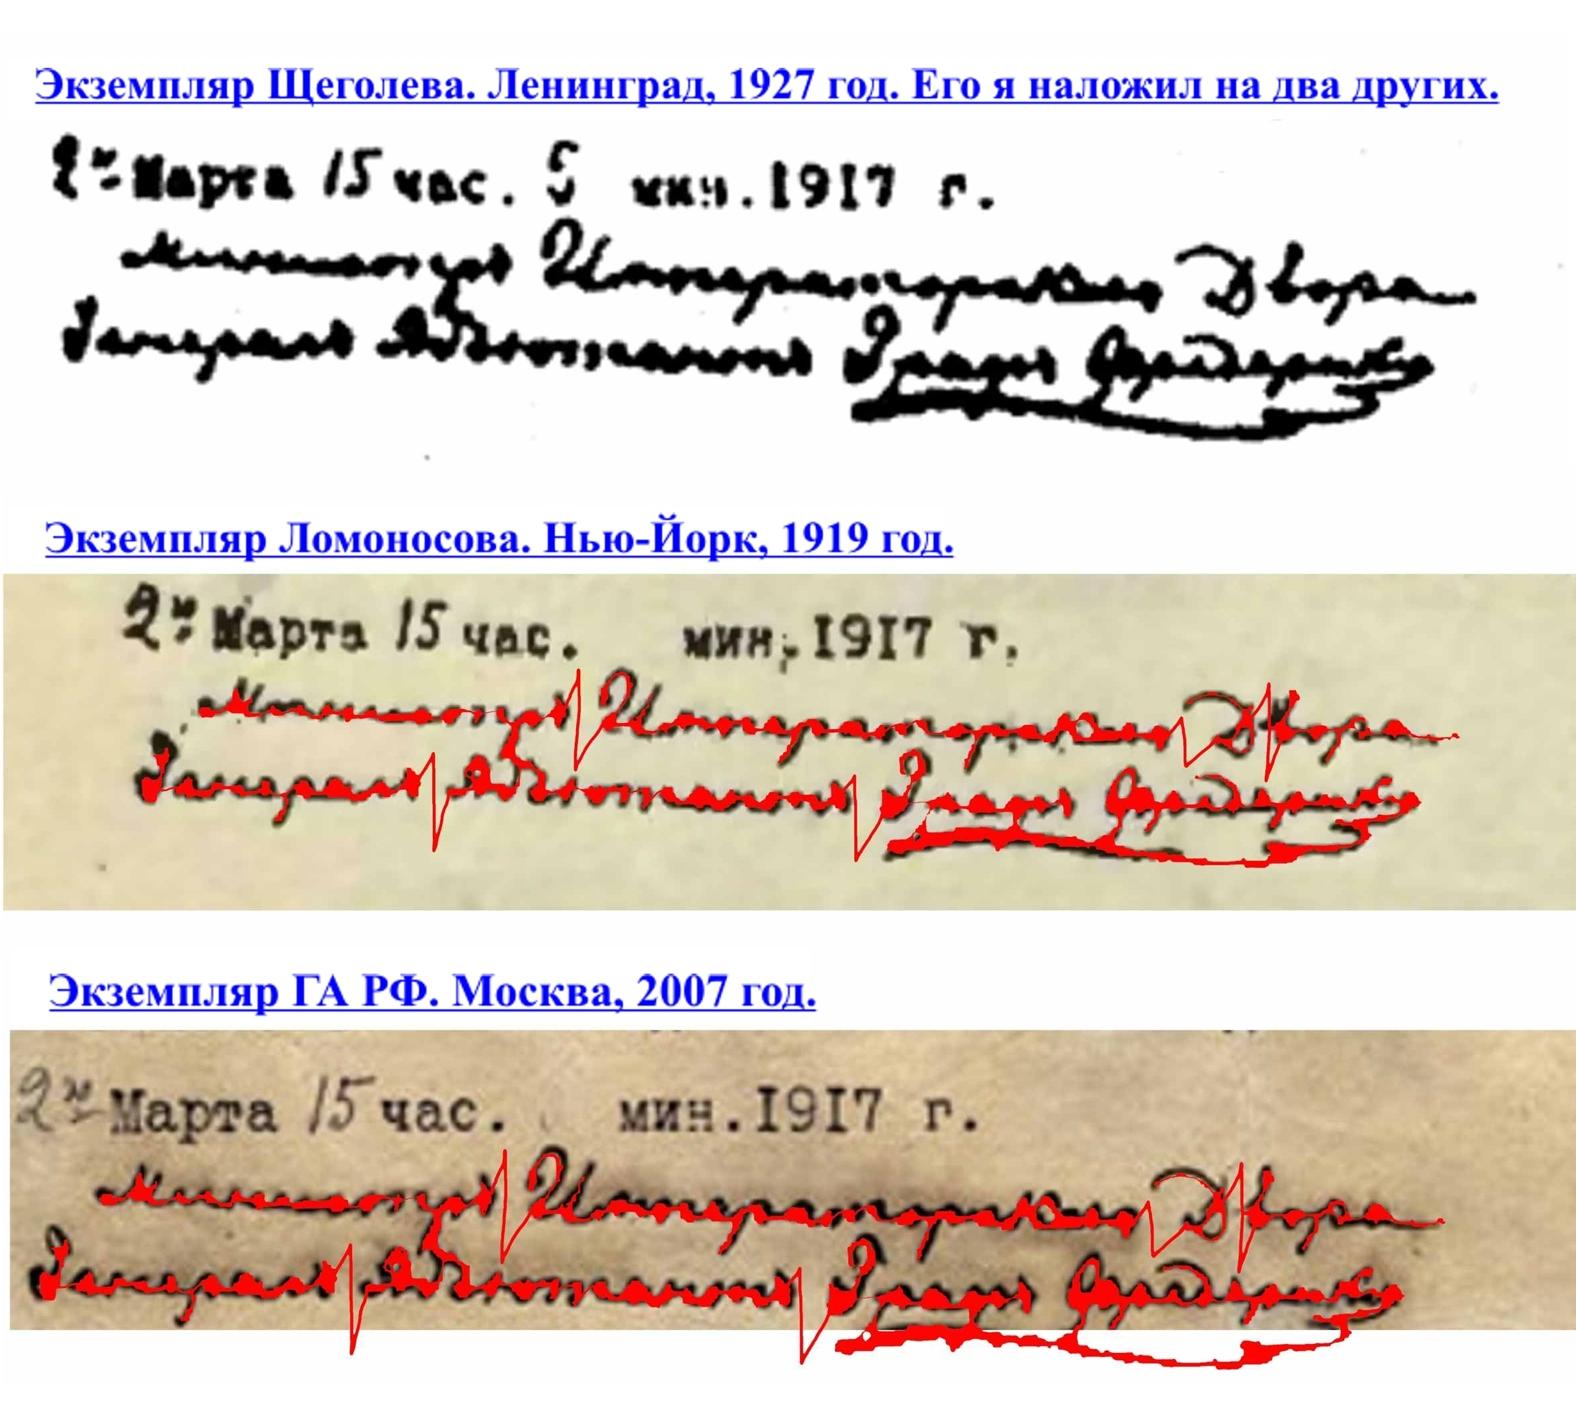 Три автографа графа Фредерикса на трёх разных документах совпали до буквы